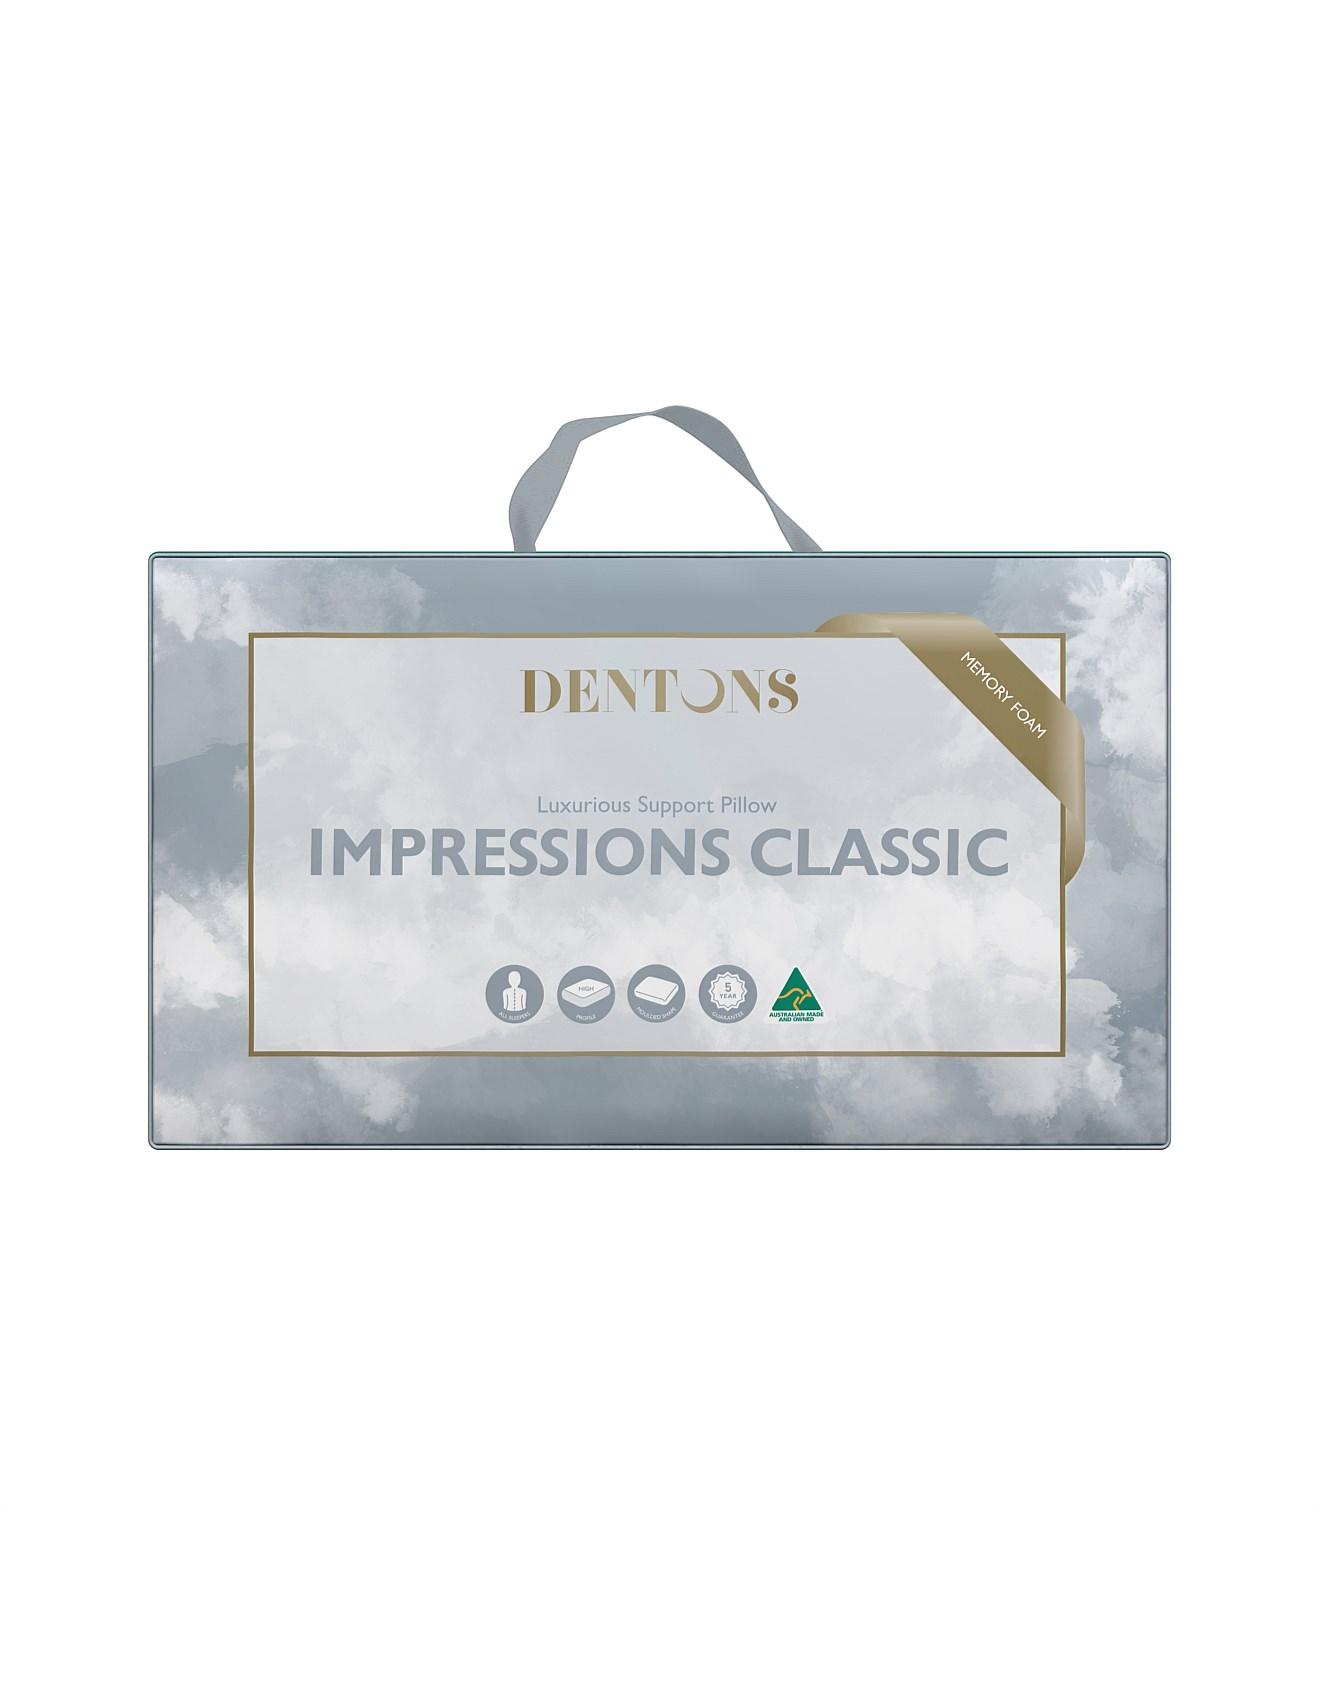 Impressions Classic Memory Foam Pillow